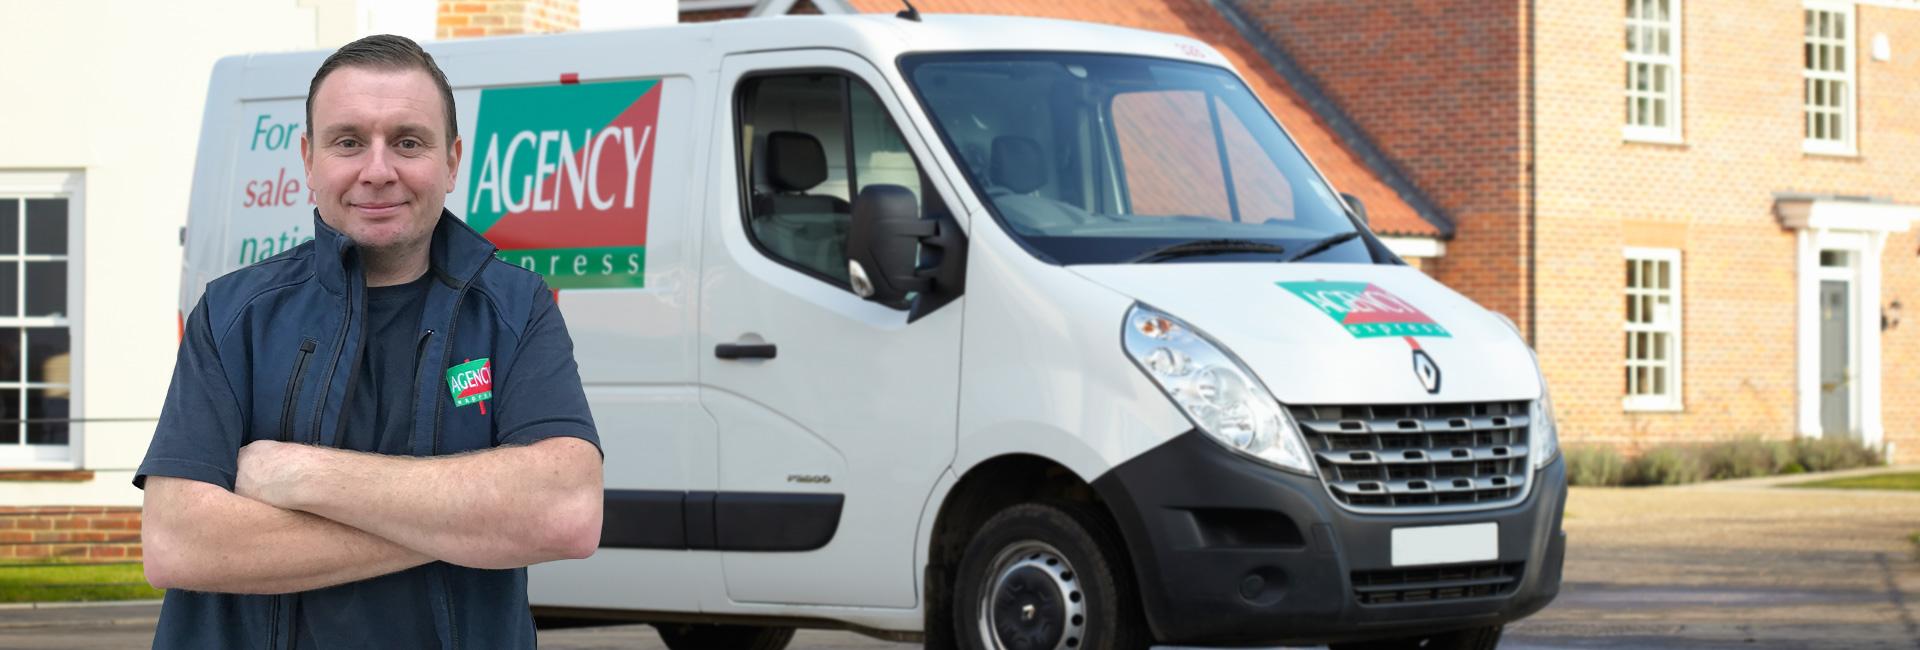 Agency Express franchise case study. Franchisee Steve Warren with van.